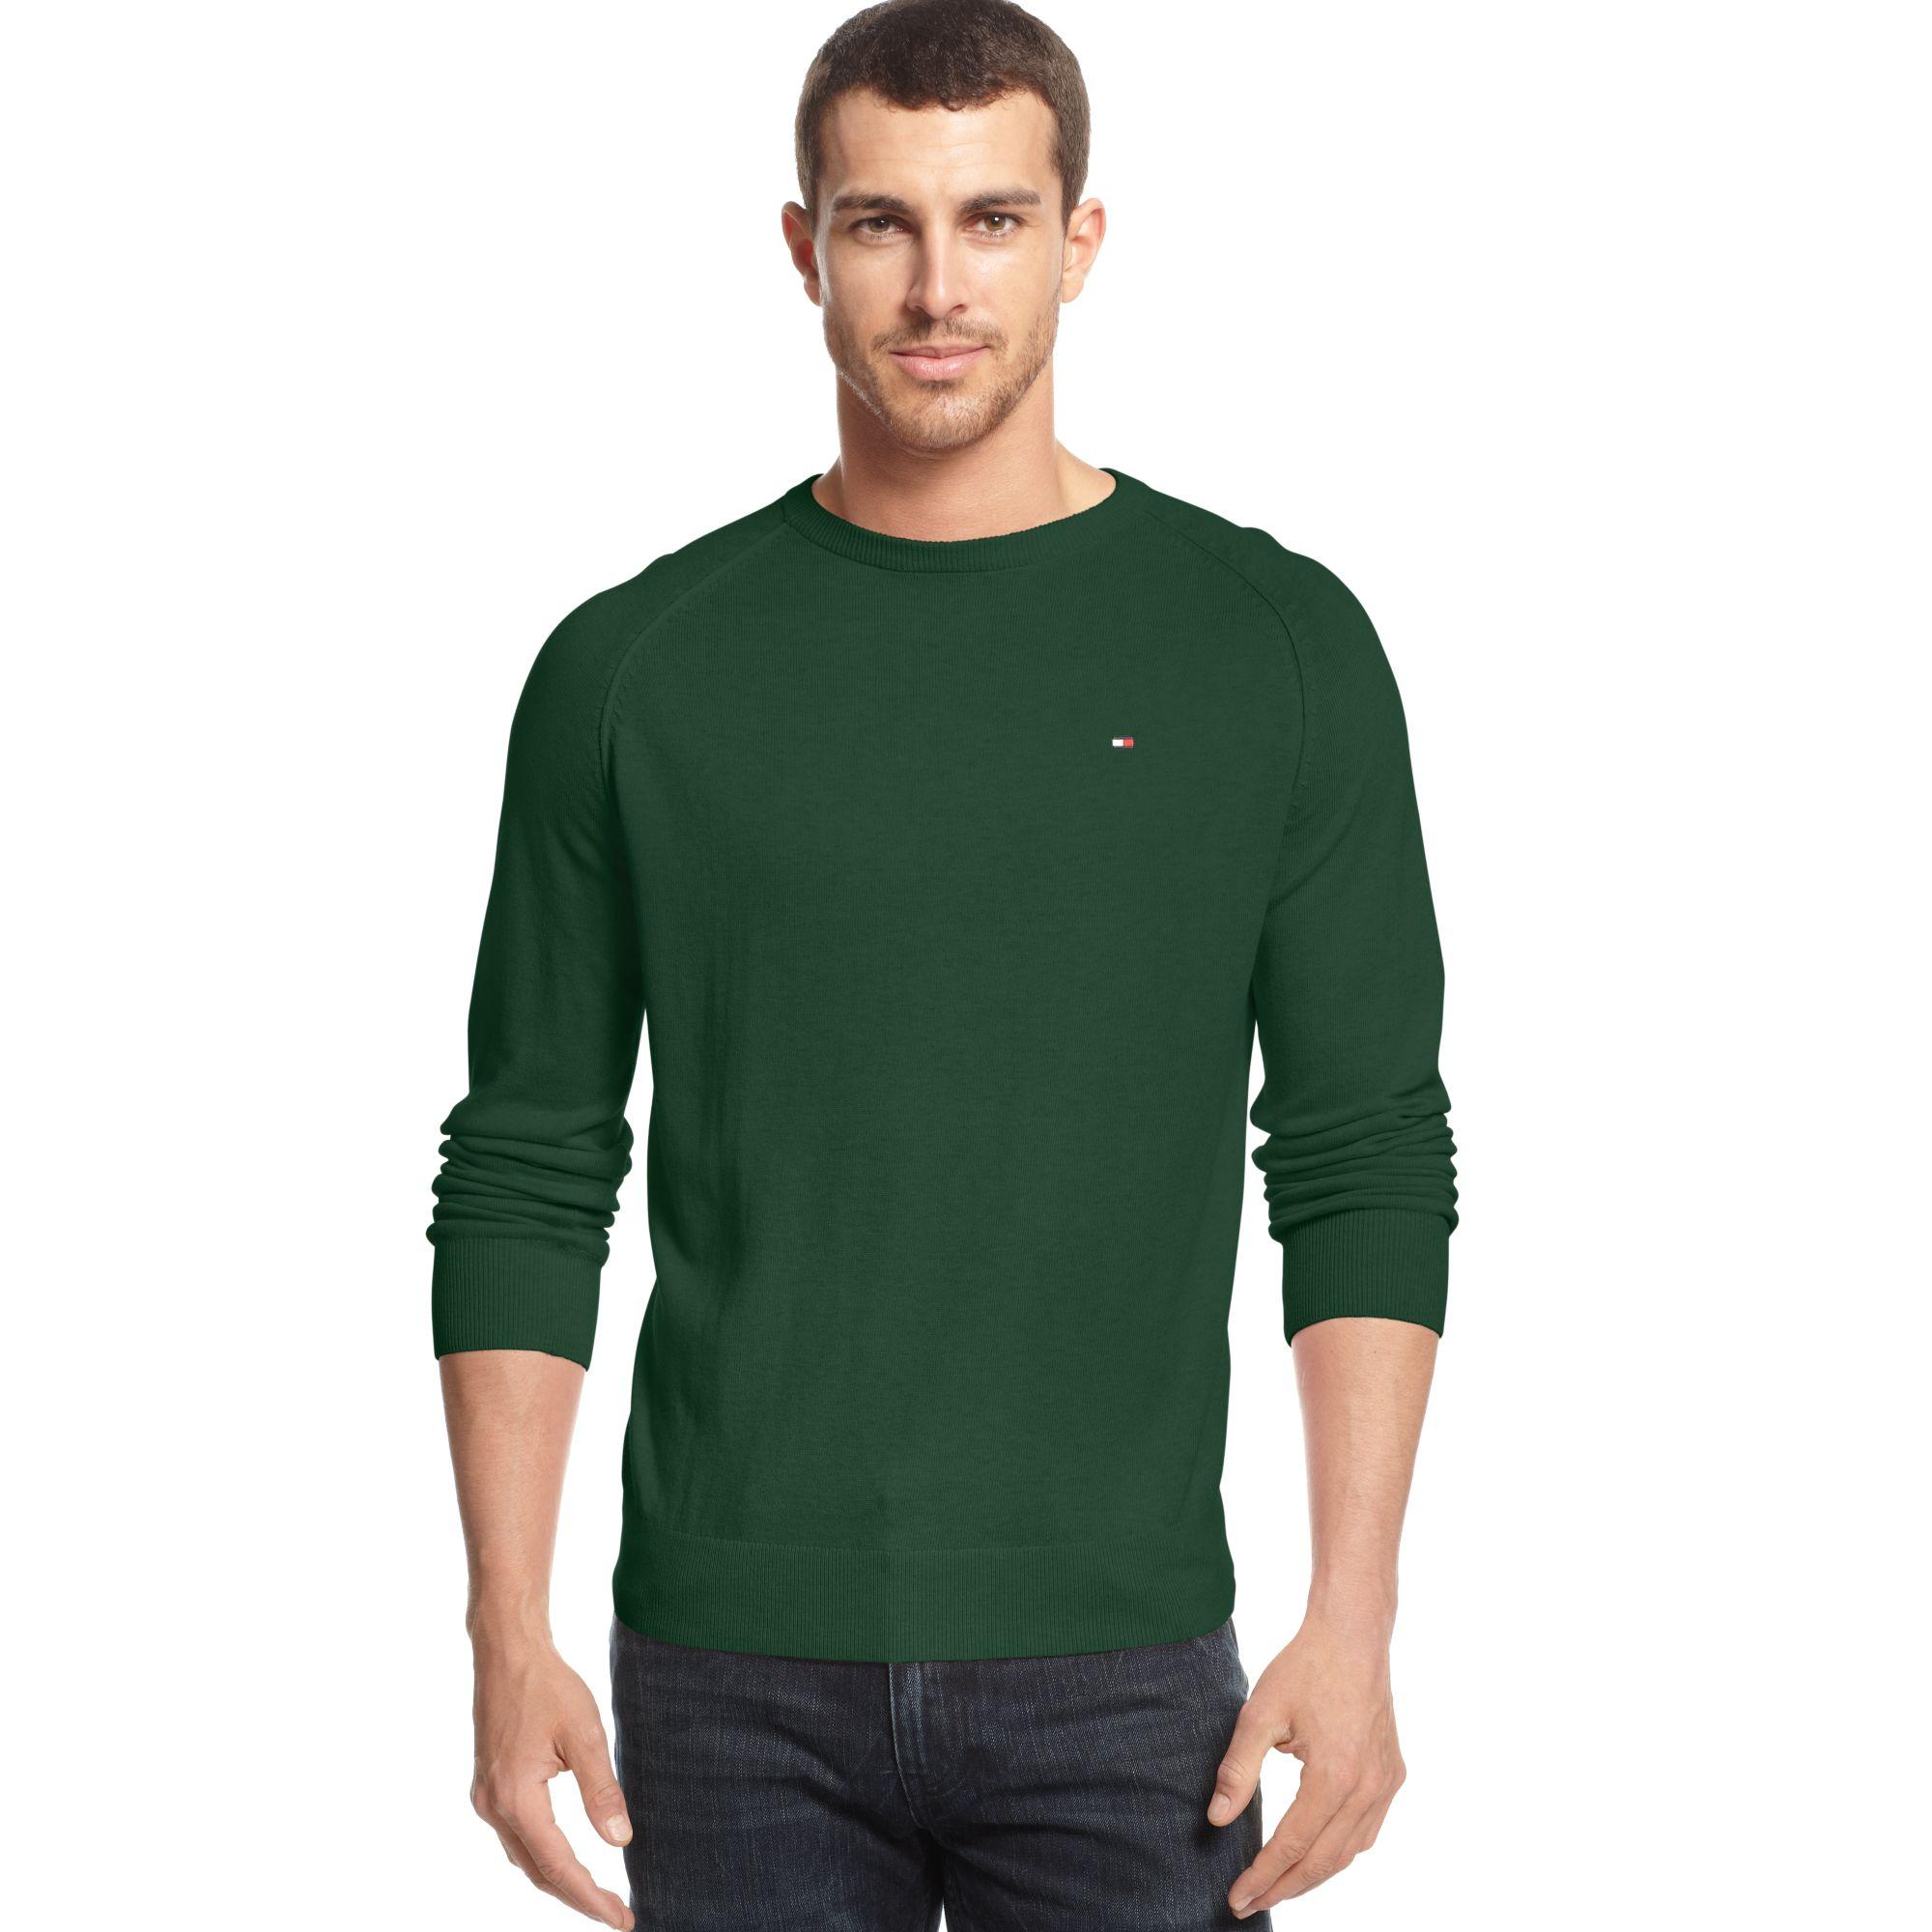 tommy hilfiger american crewneck sweater in green for men lyst. Black Bedroom Furniture Sets. Home Design Ideas